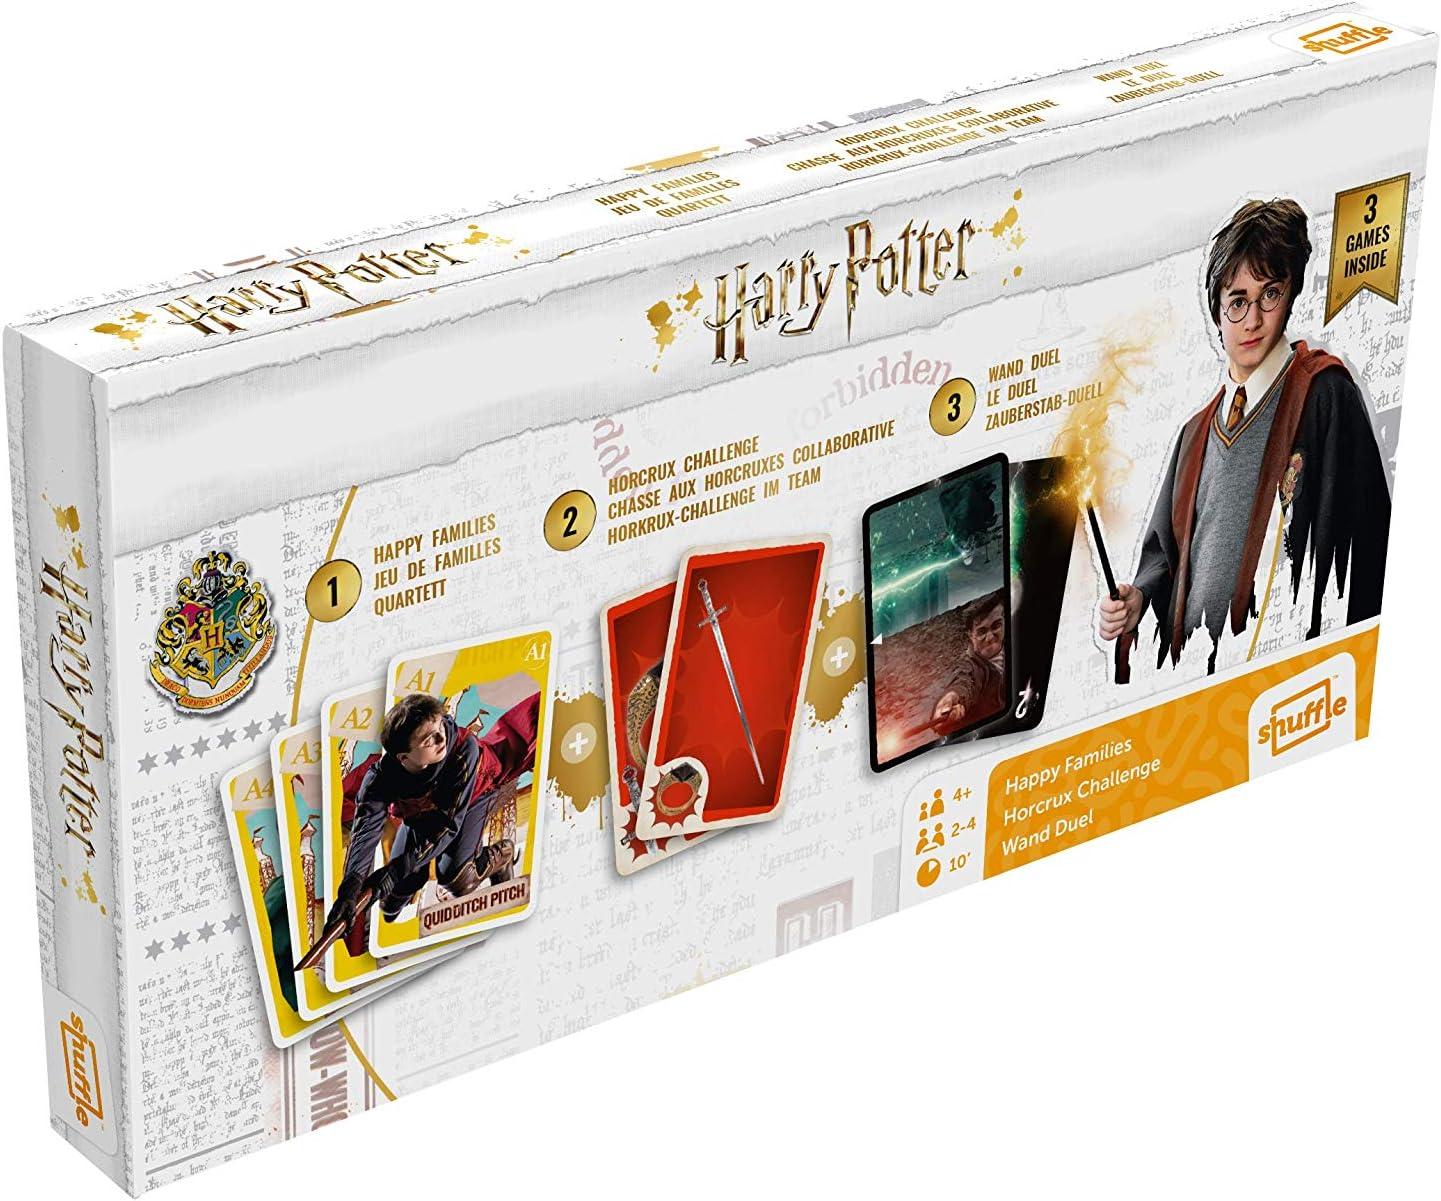 ASS- Tripack Harry Potter Juego de Cartas, Multicolor (Cartamundi 108448992)